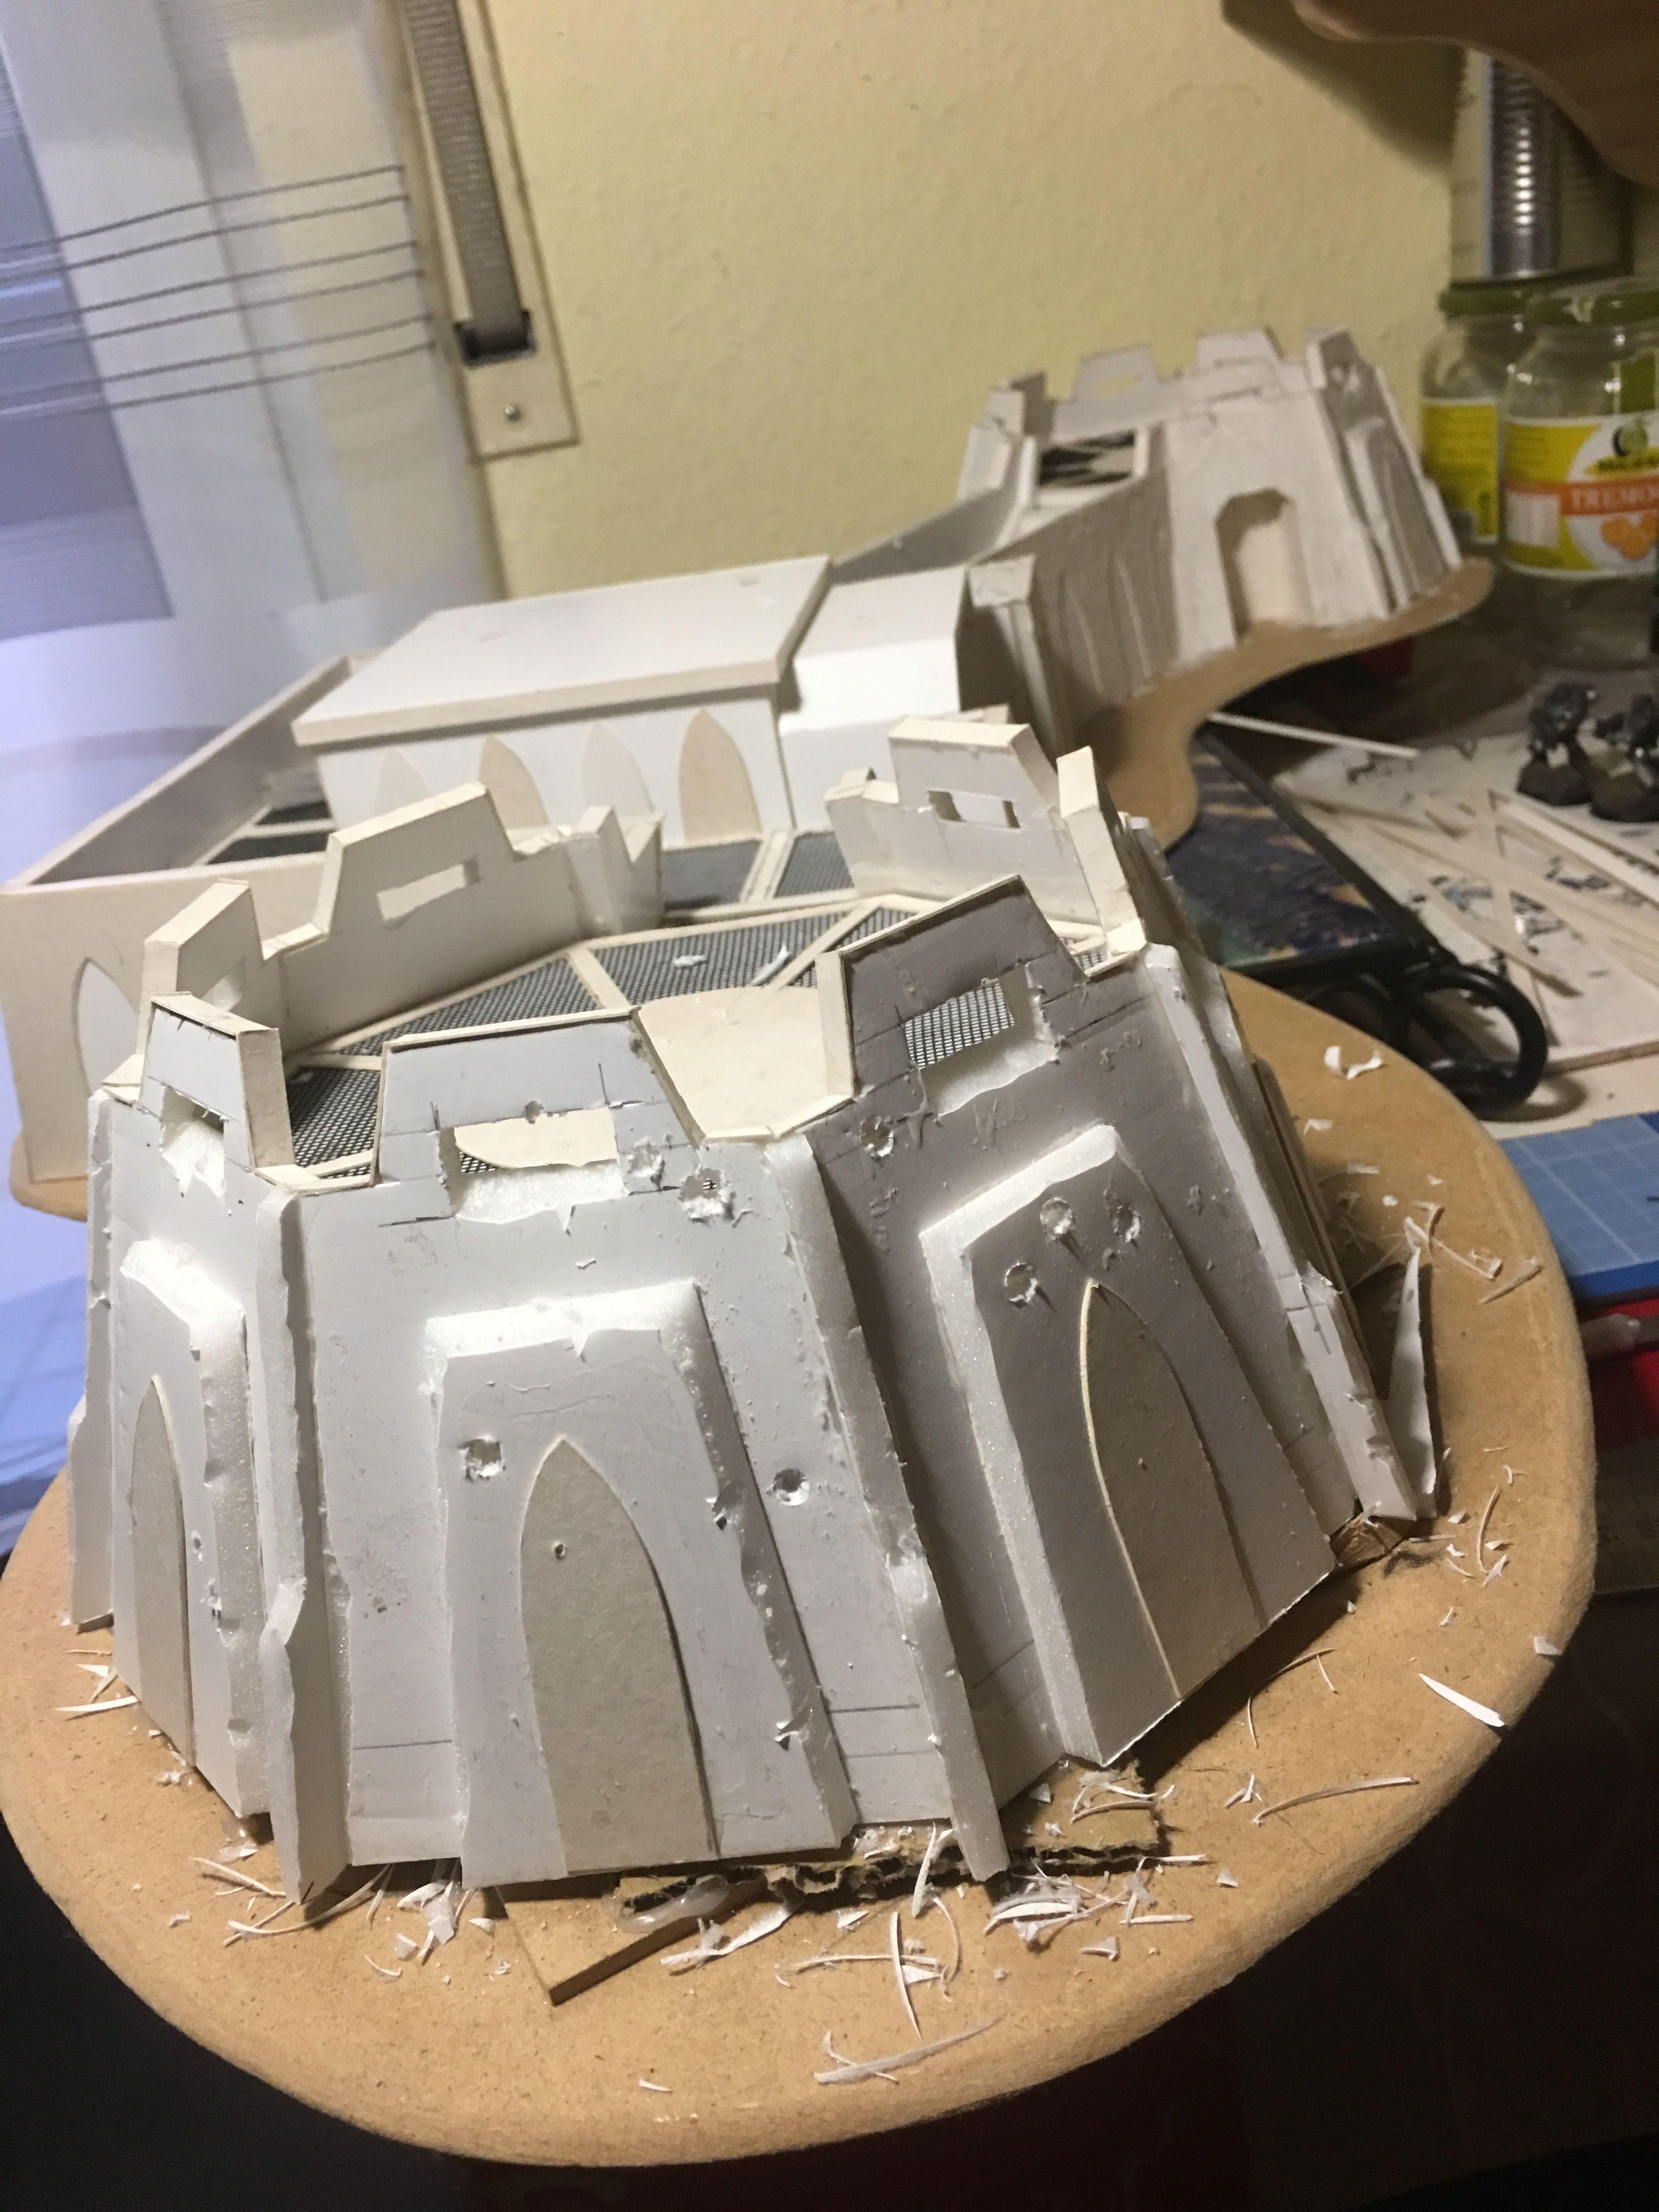 DIY game terrian and building | Game: Sci-fi models